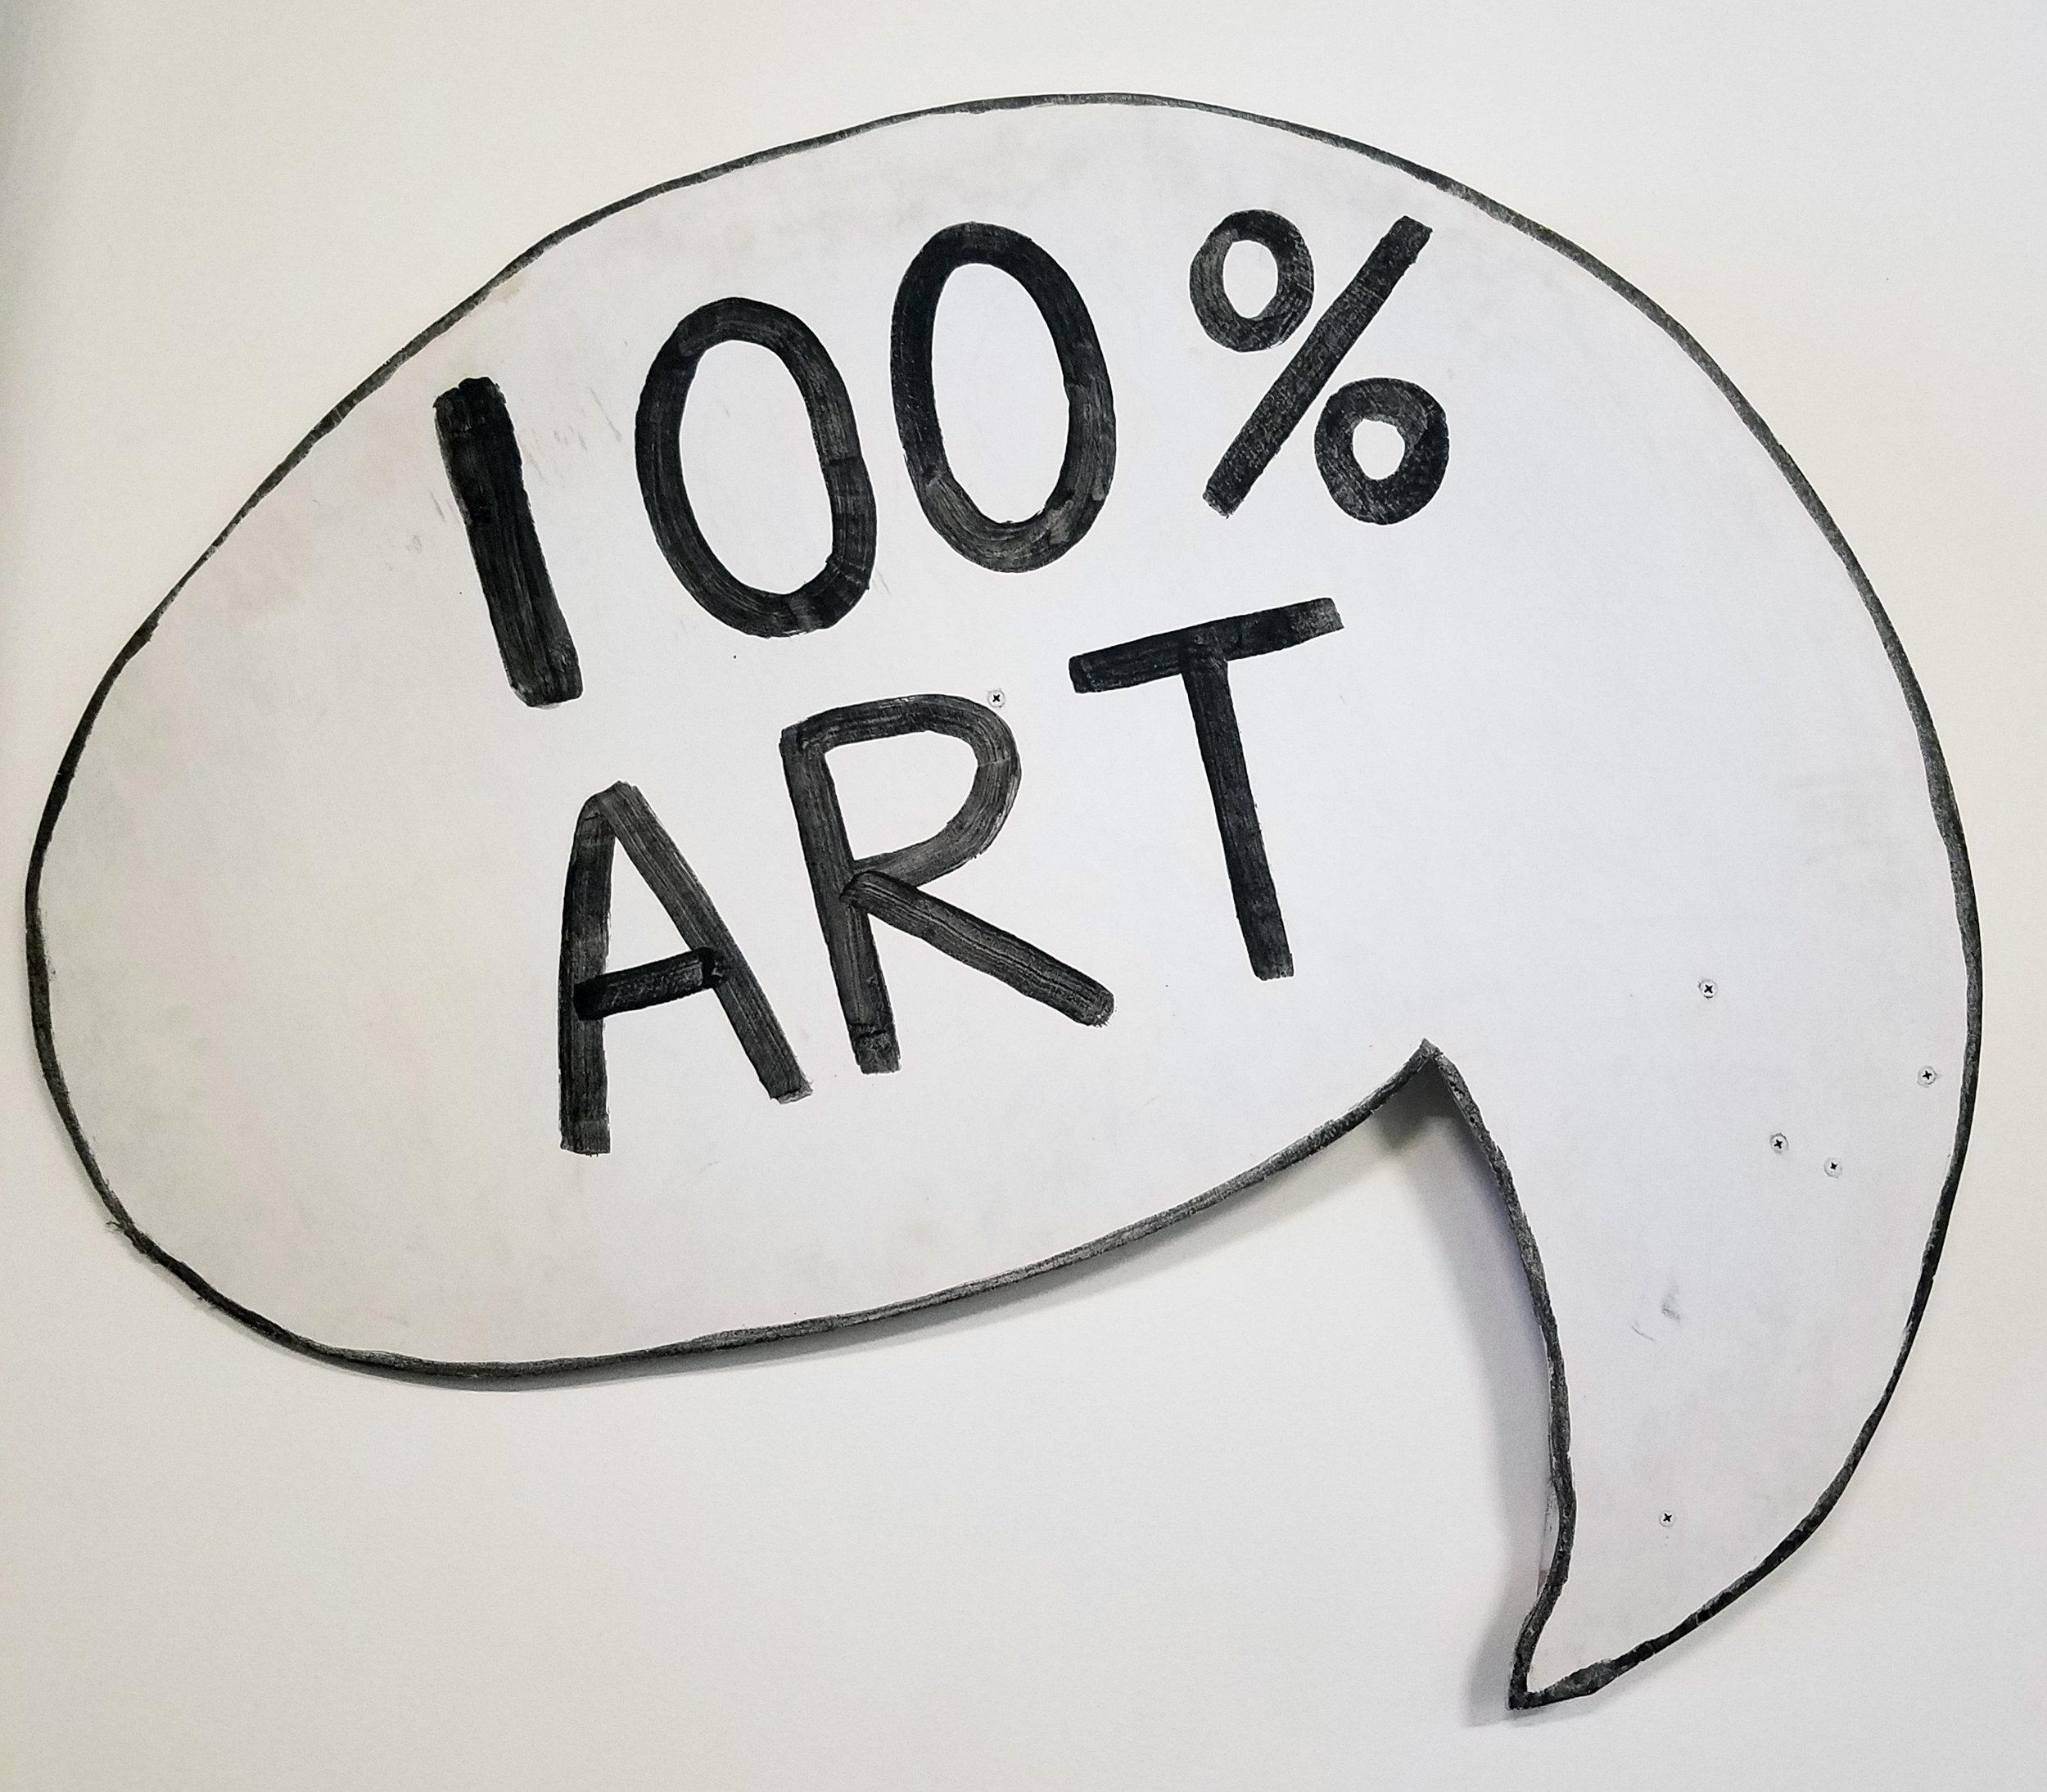 Mark Freeland, 100% Art Speech Bubble.jpg